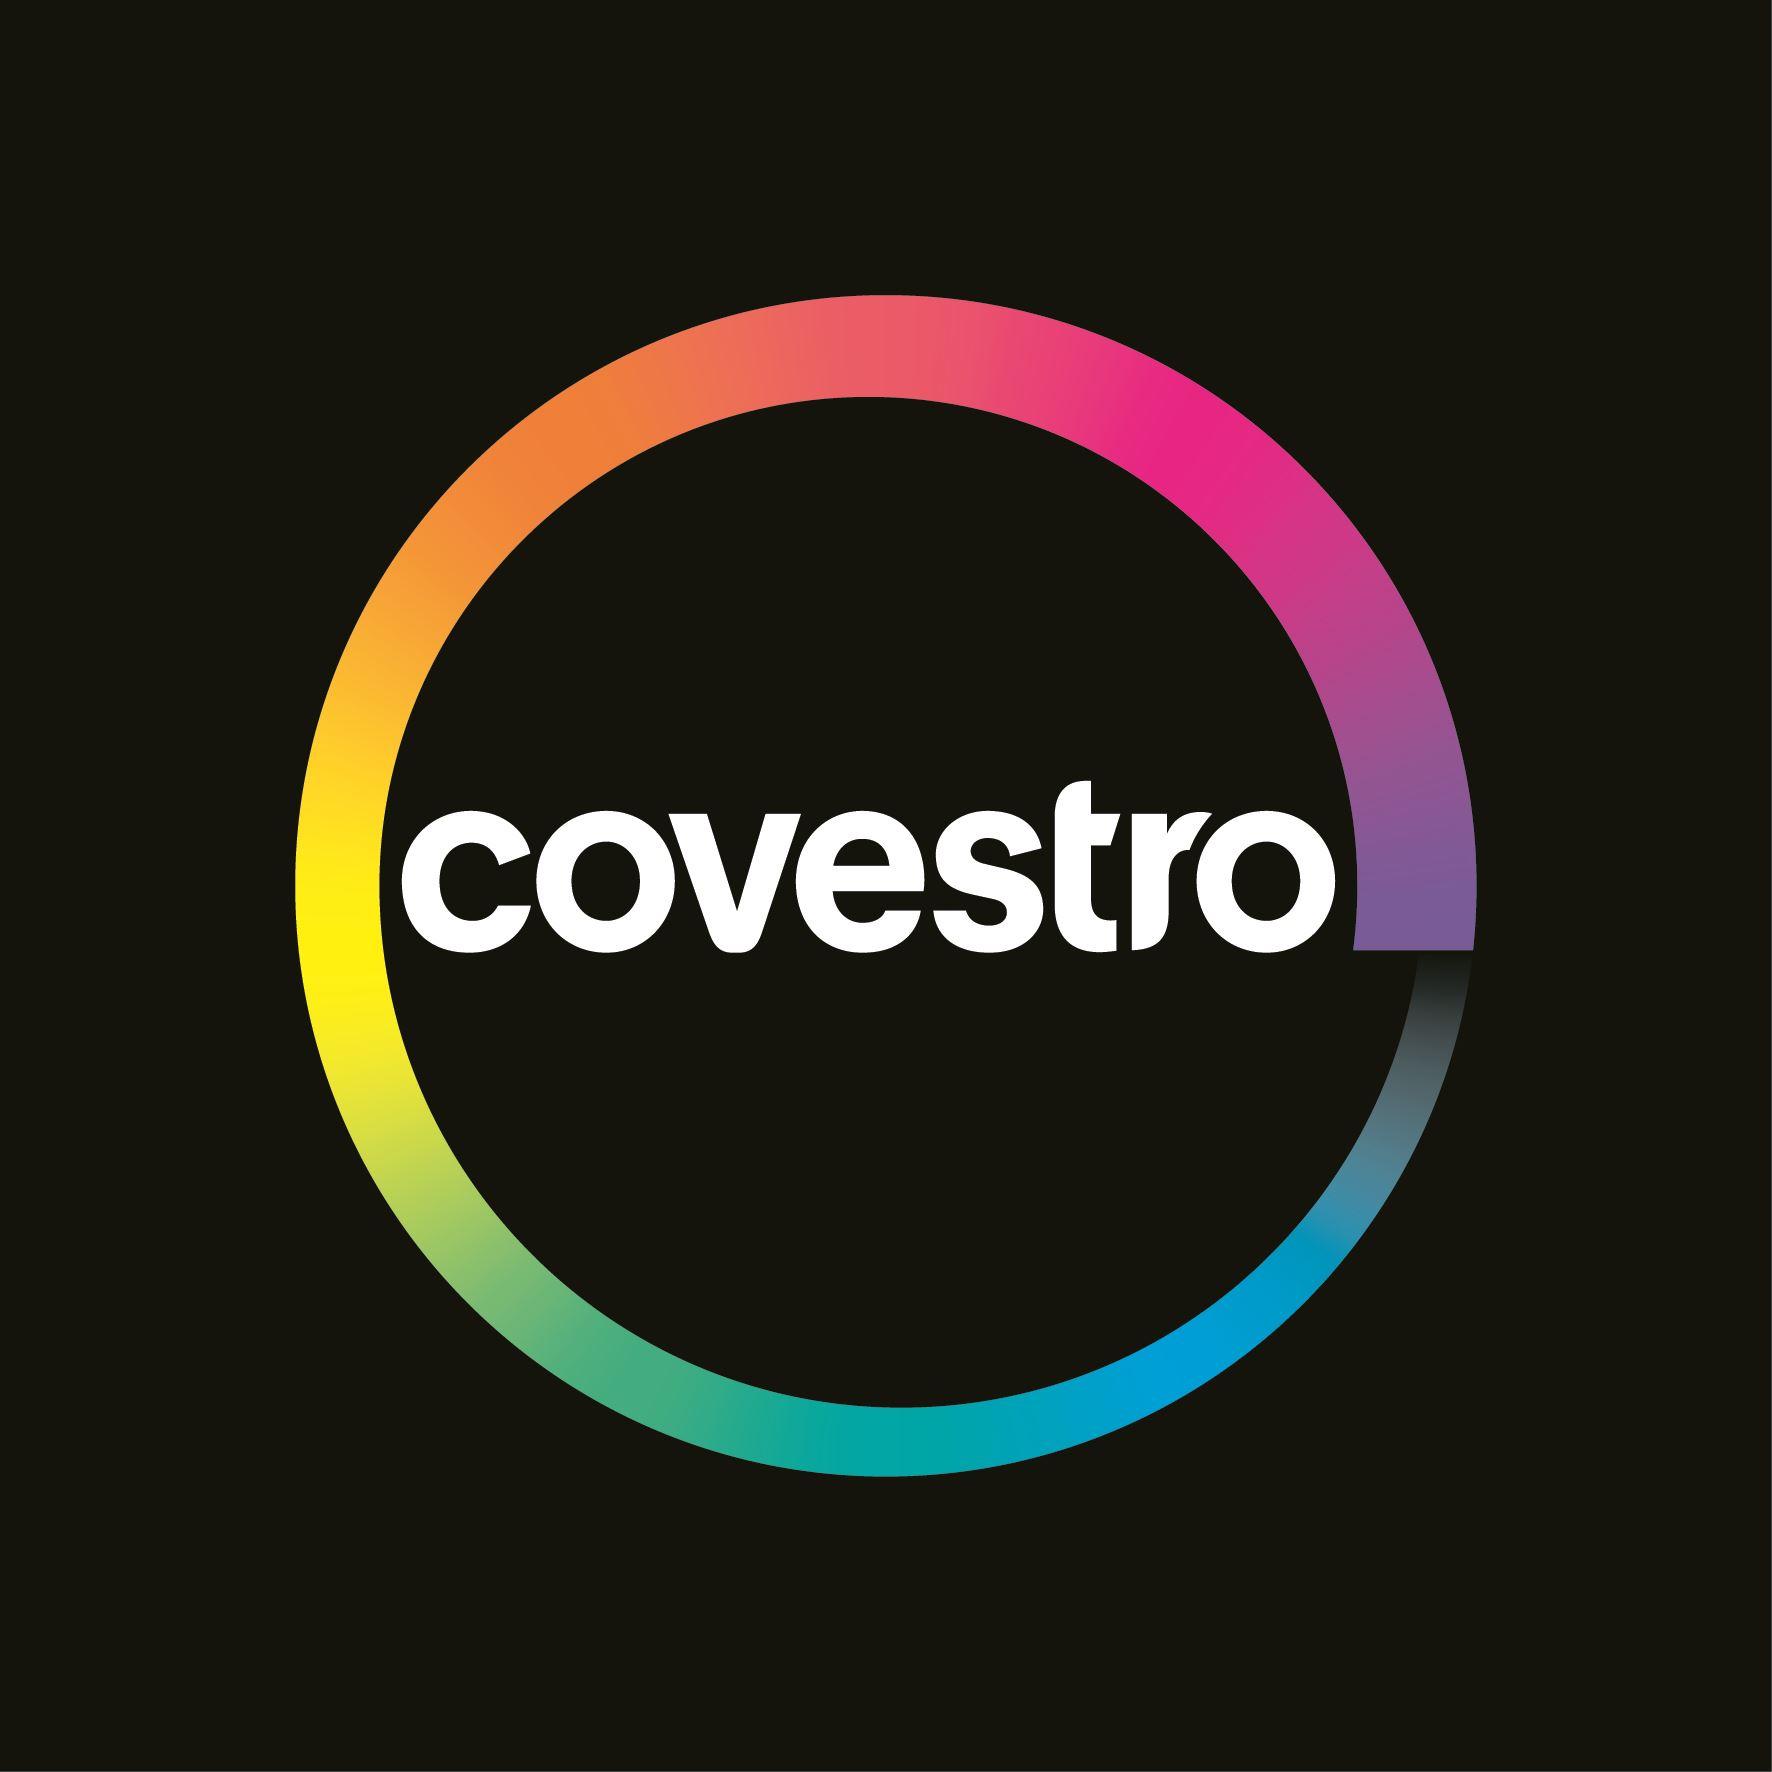 Covestra